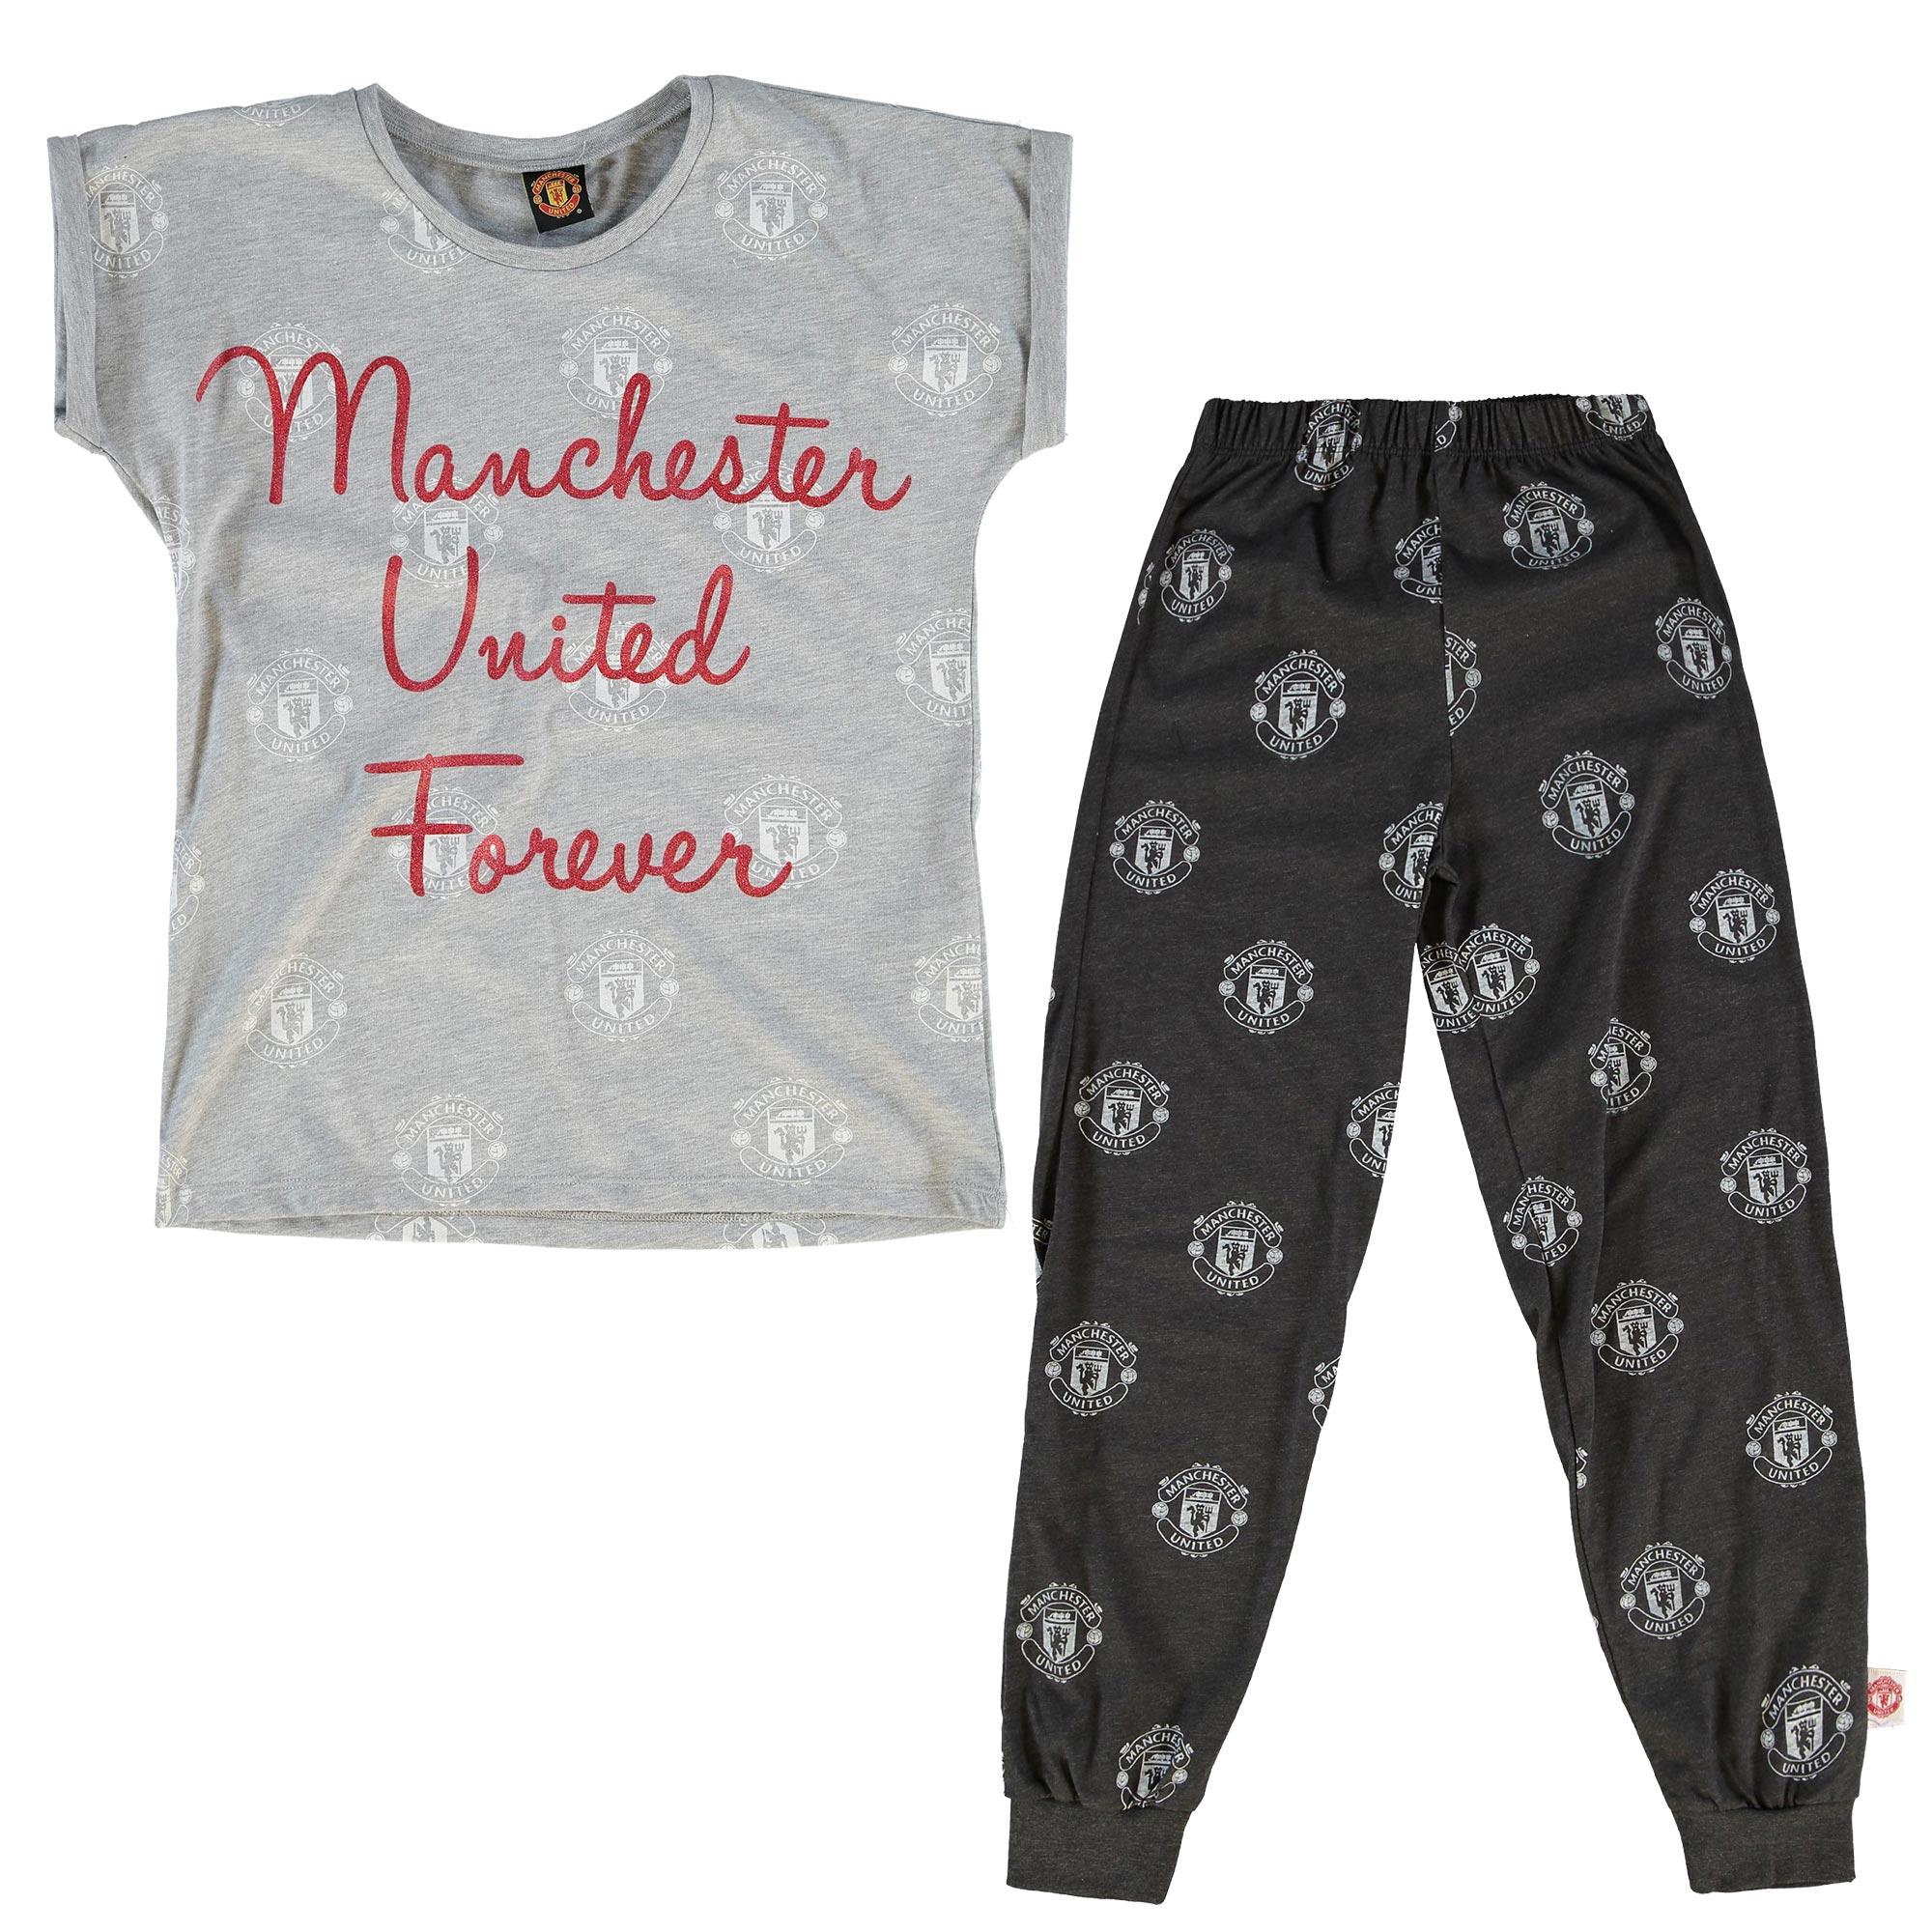 Manchester United Forever Pyjamas - Grey Marl/Charcoal Marl - Older Gi